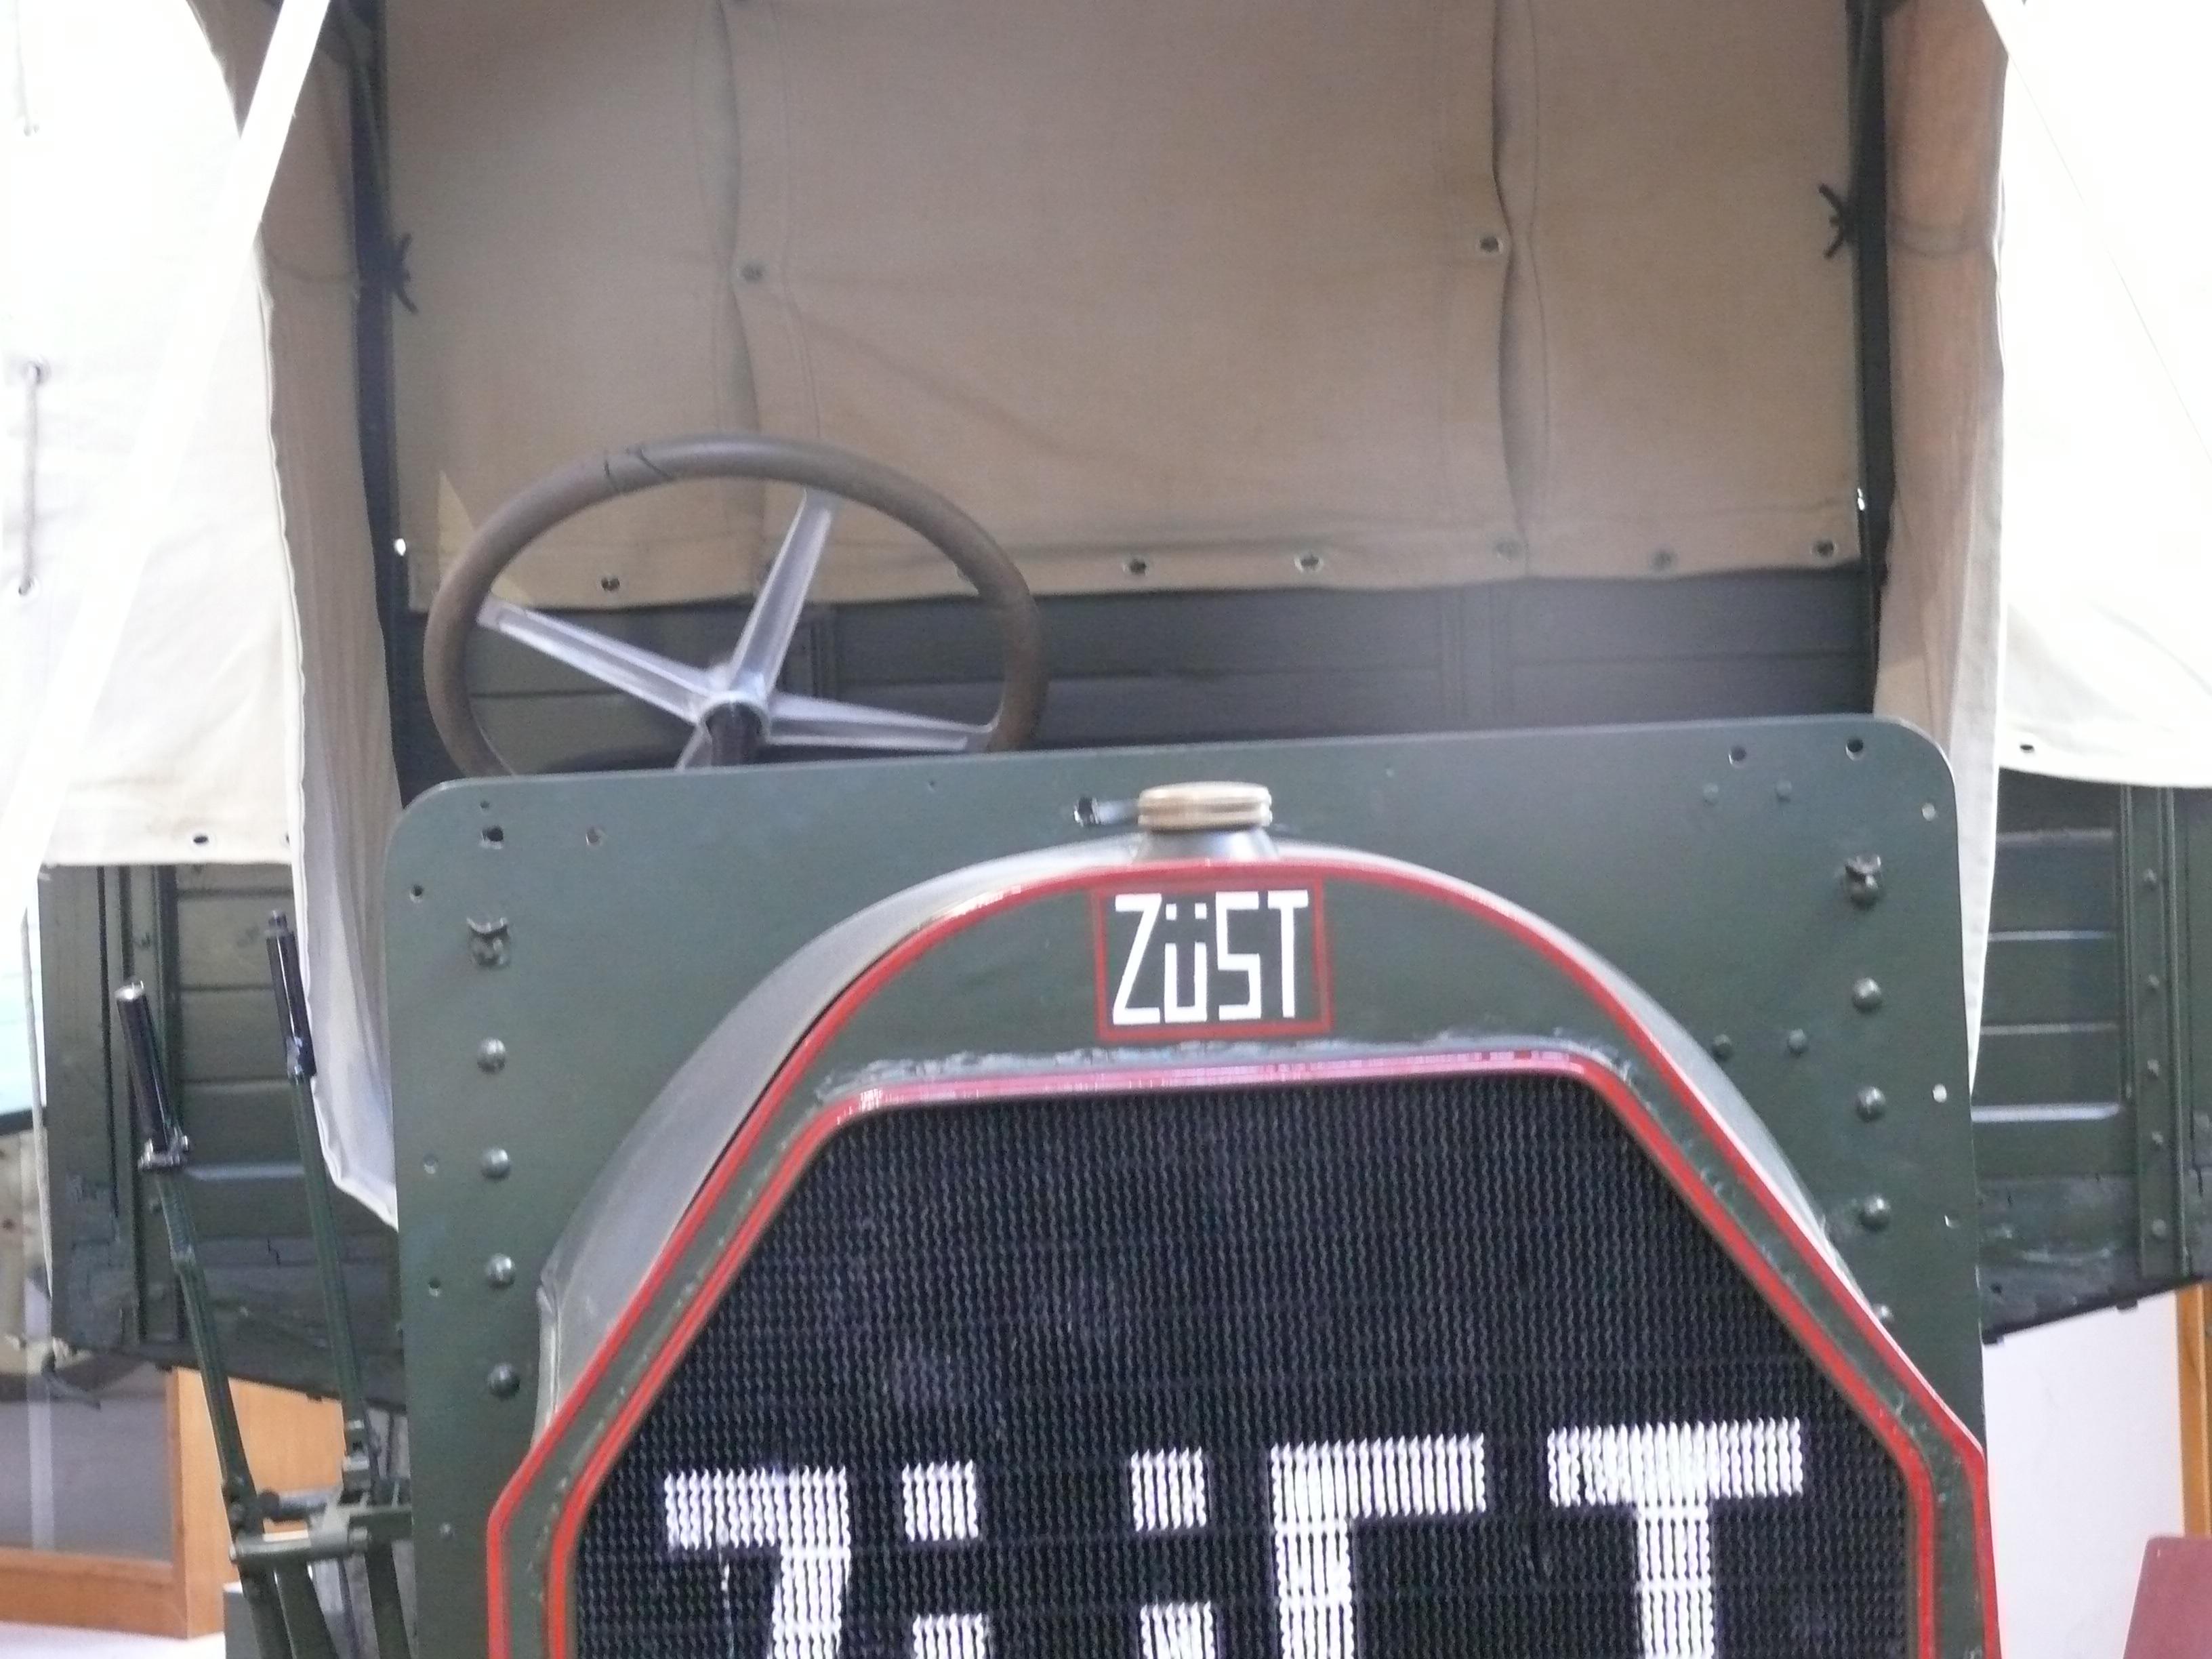 z u00fcst autocarro 1912 rome  maquetland com   le monde de la